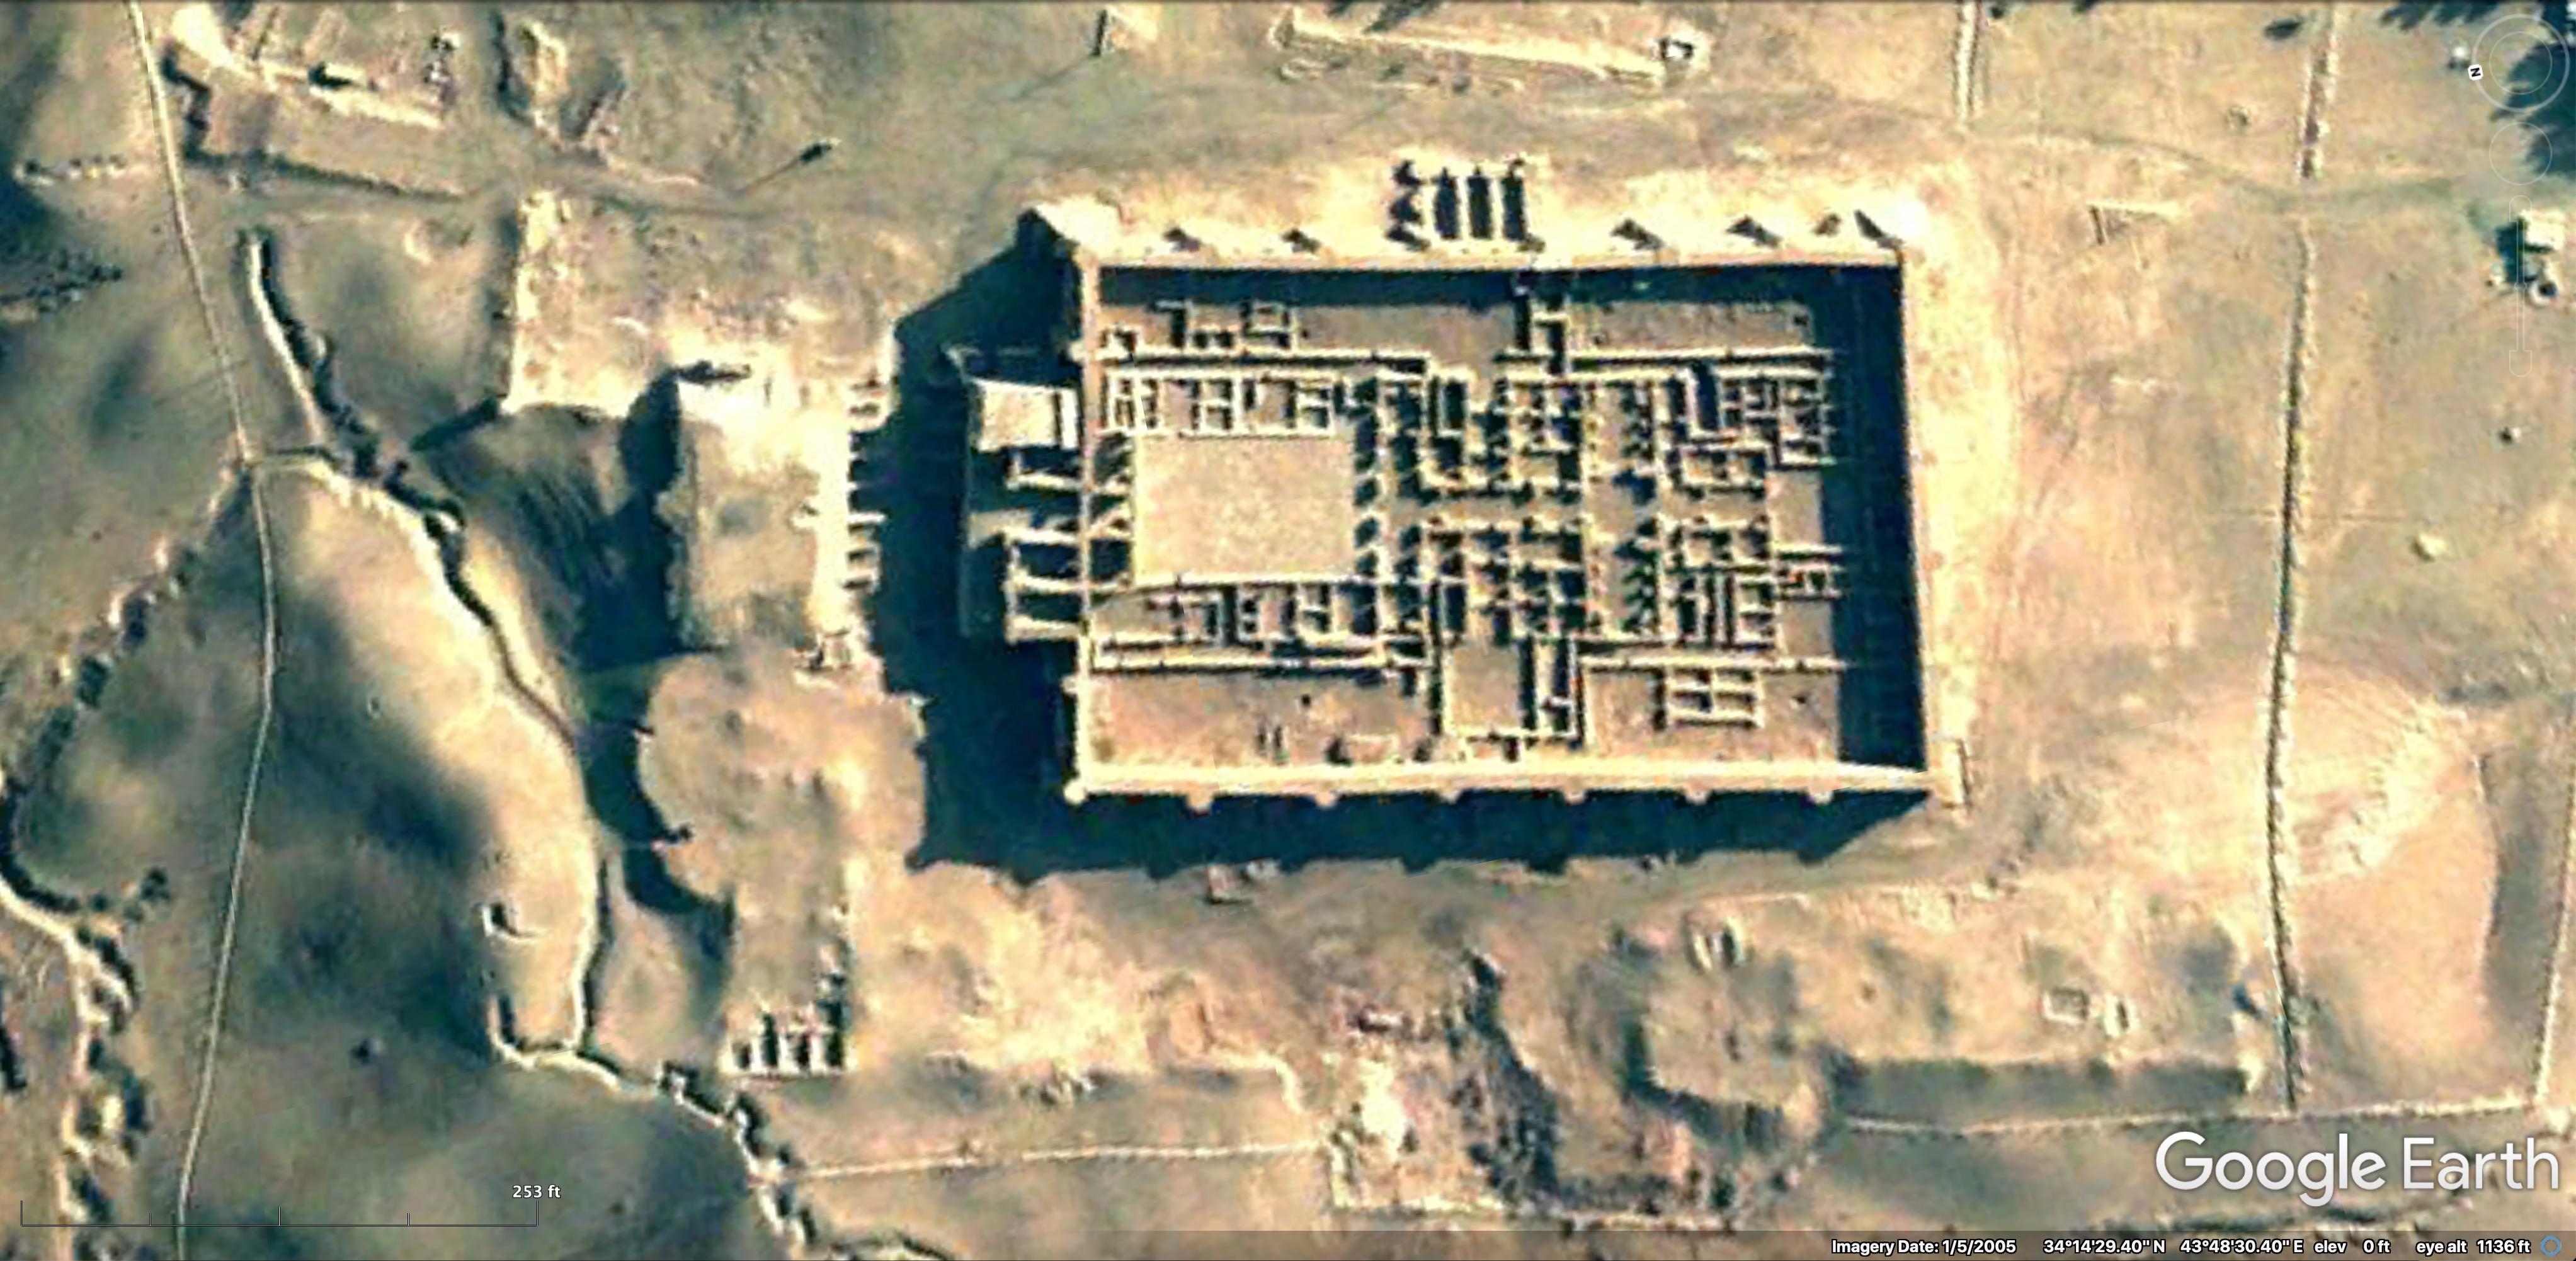 Google Earth Pro 2020-09-29 20-56-50.jpg